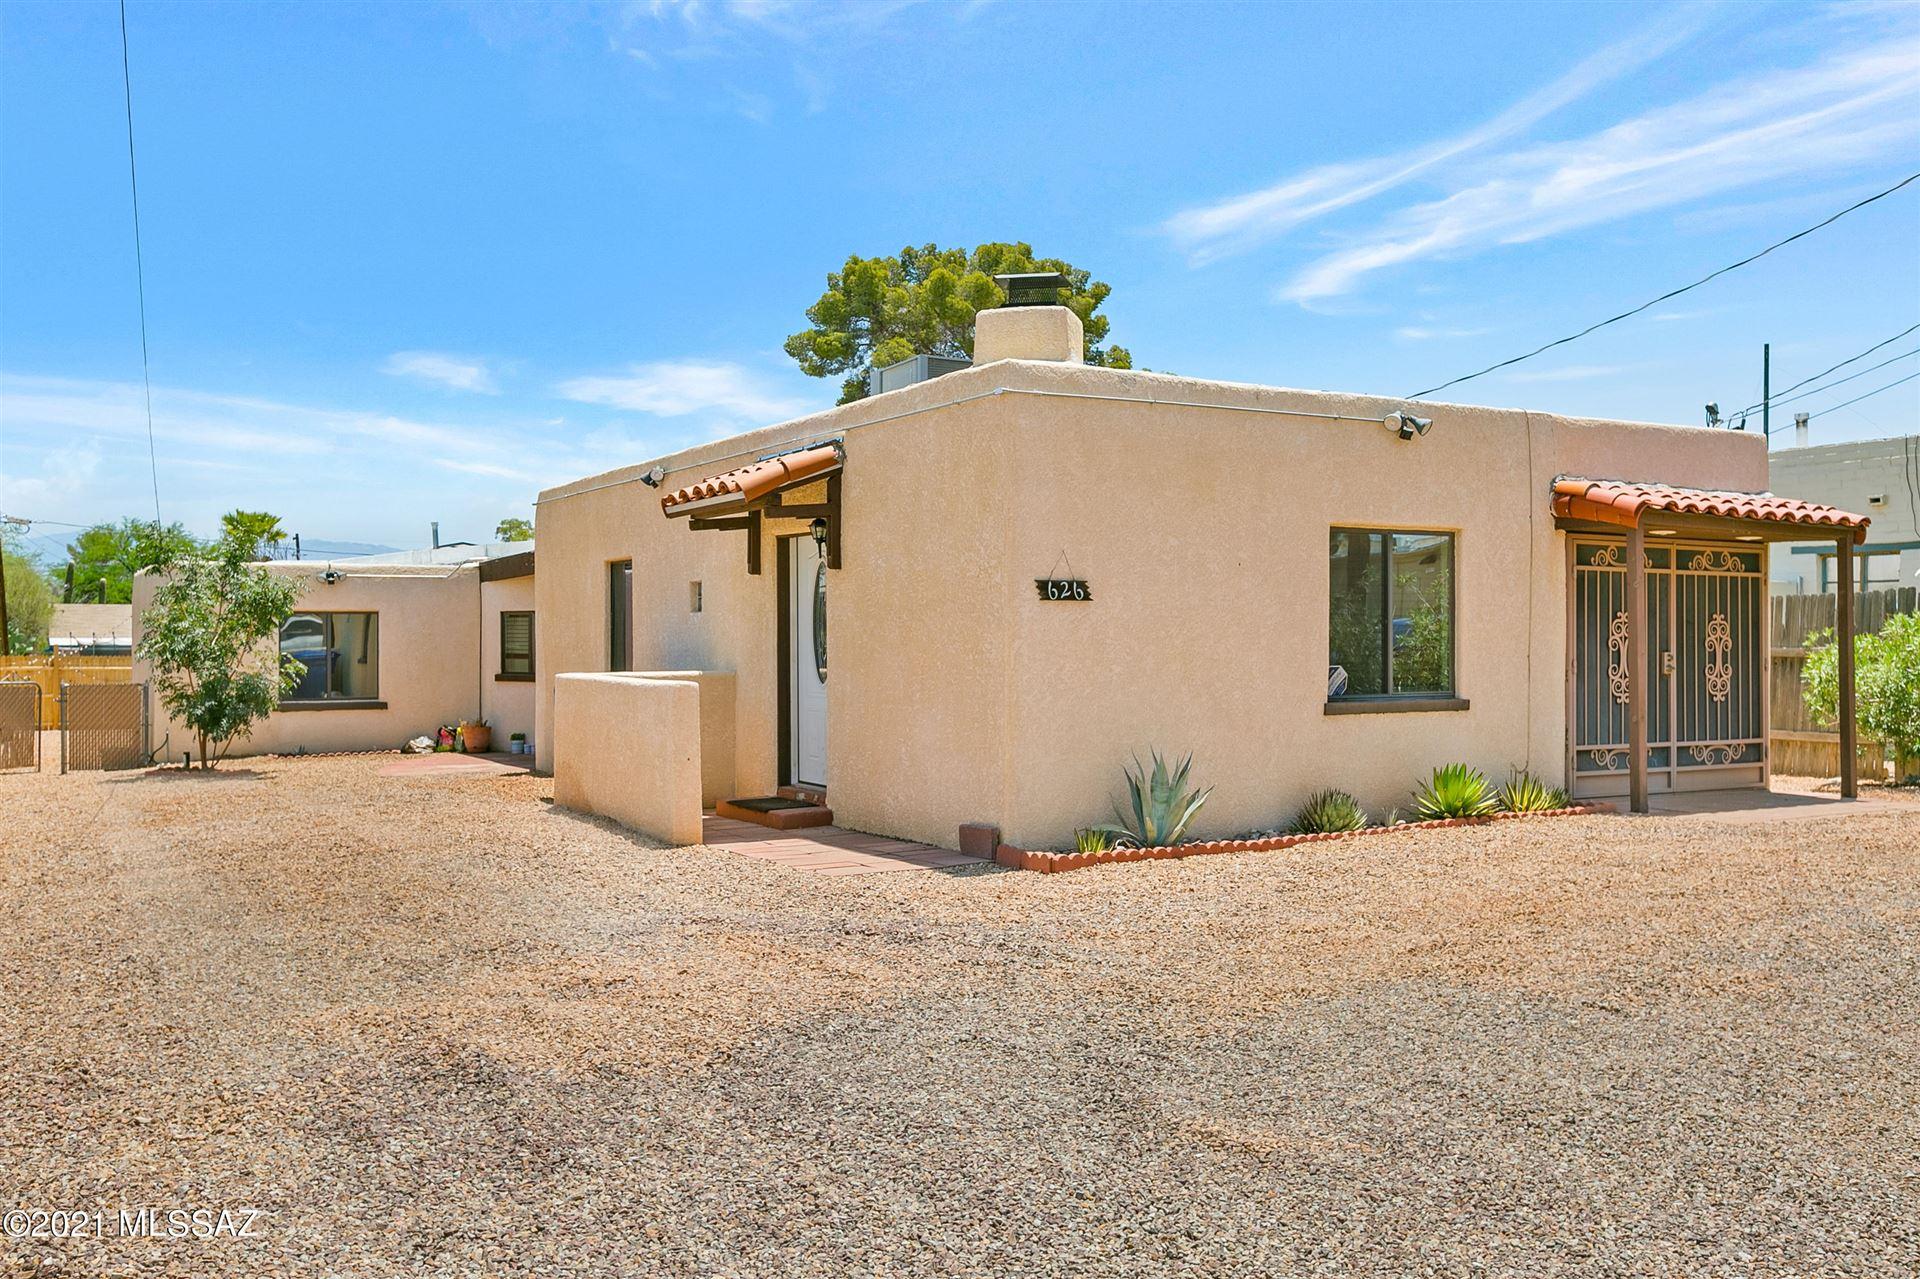 626 N Belvedere Avenue, Tucson, AZ 85711 - MLS#: 22117986